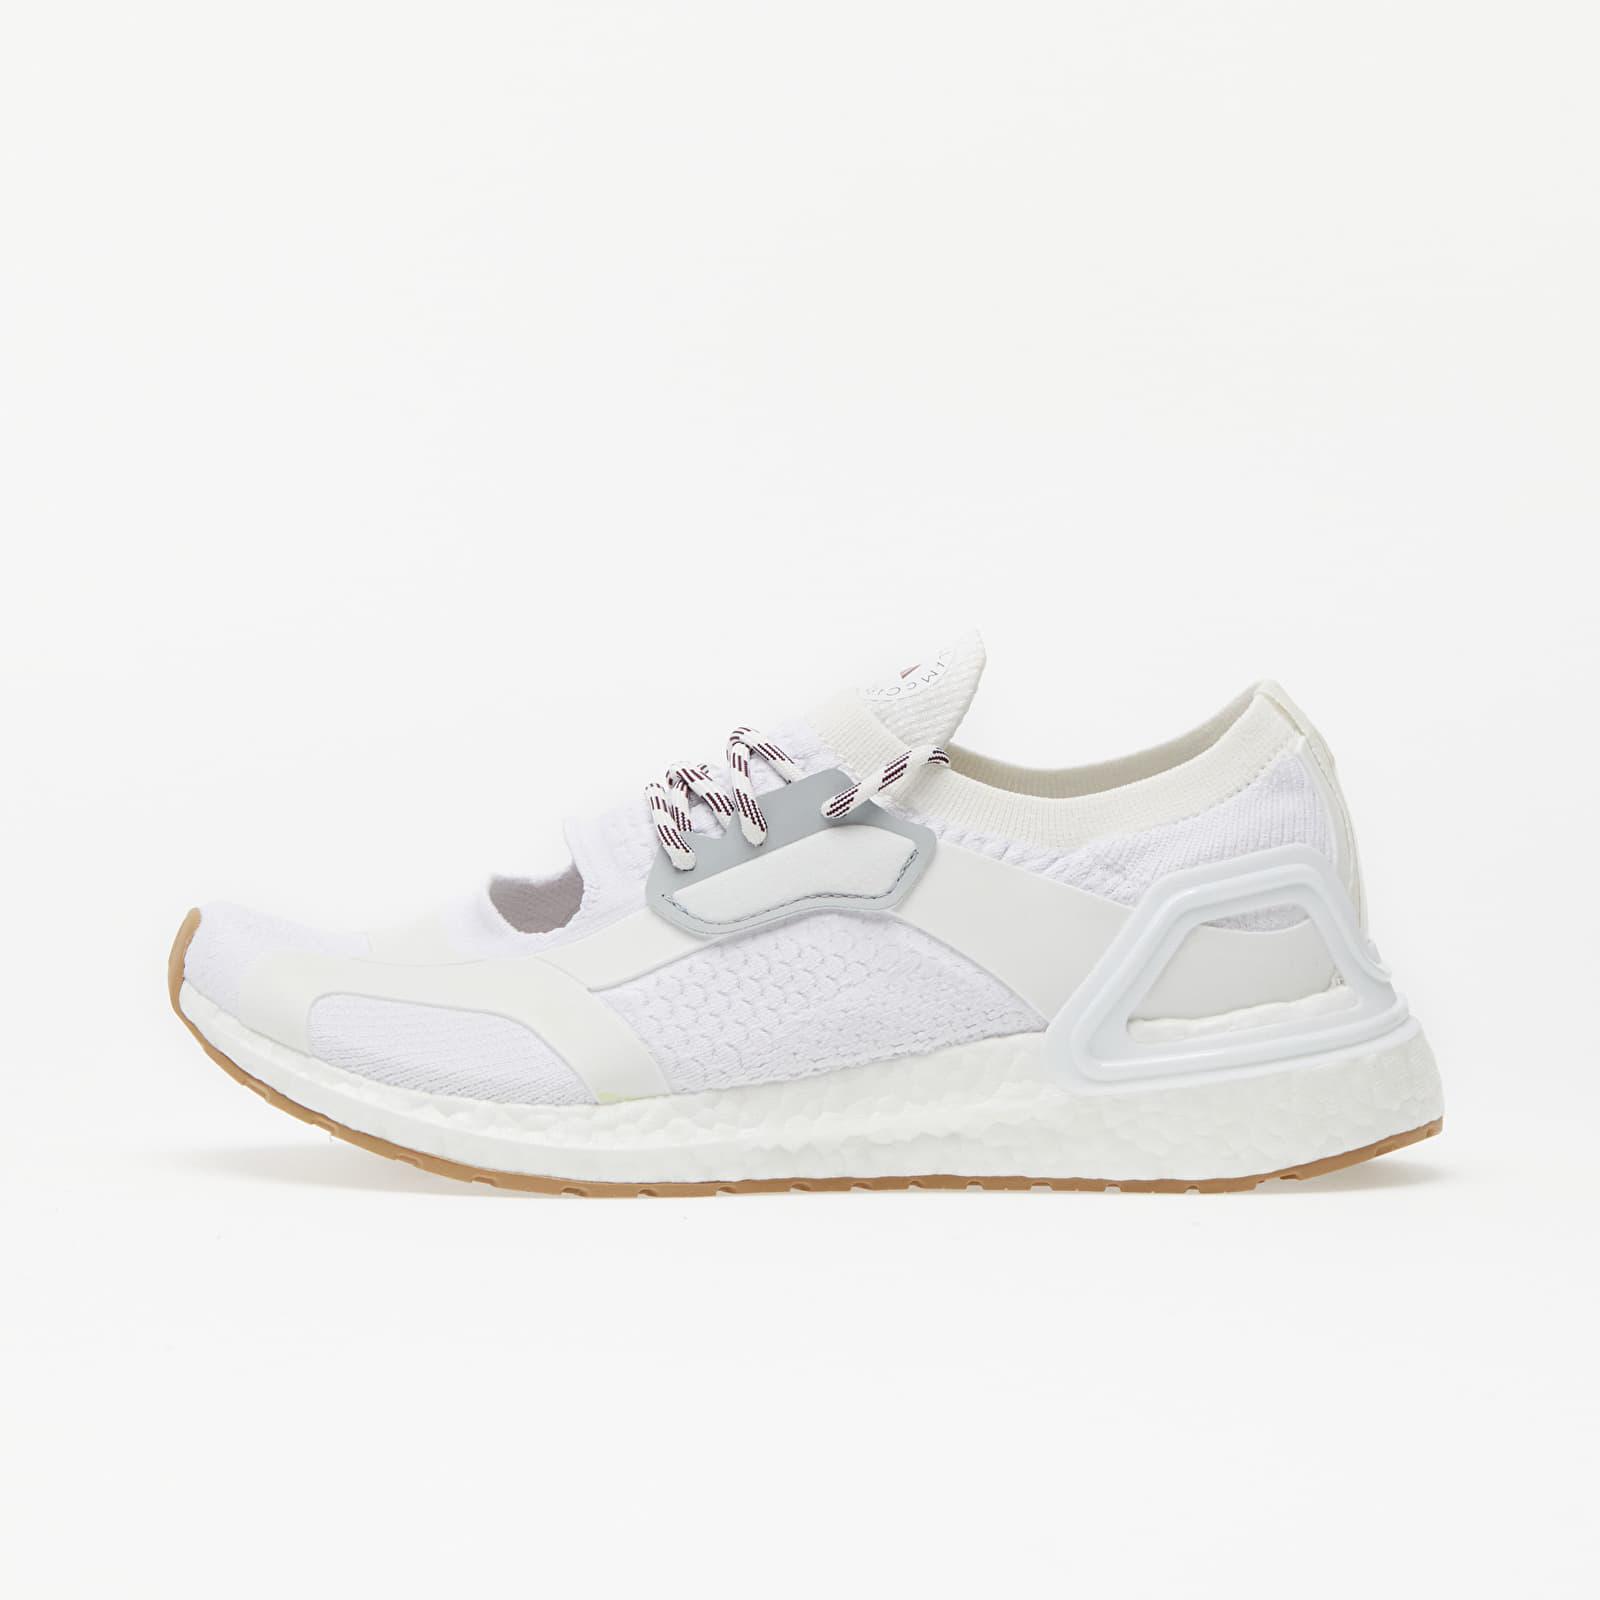 adidas x Stella McCartney UltraBOOST Sandal Ftwr White/ Off White/ Cloud White FZ3039